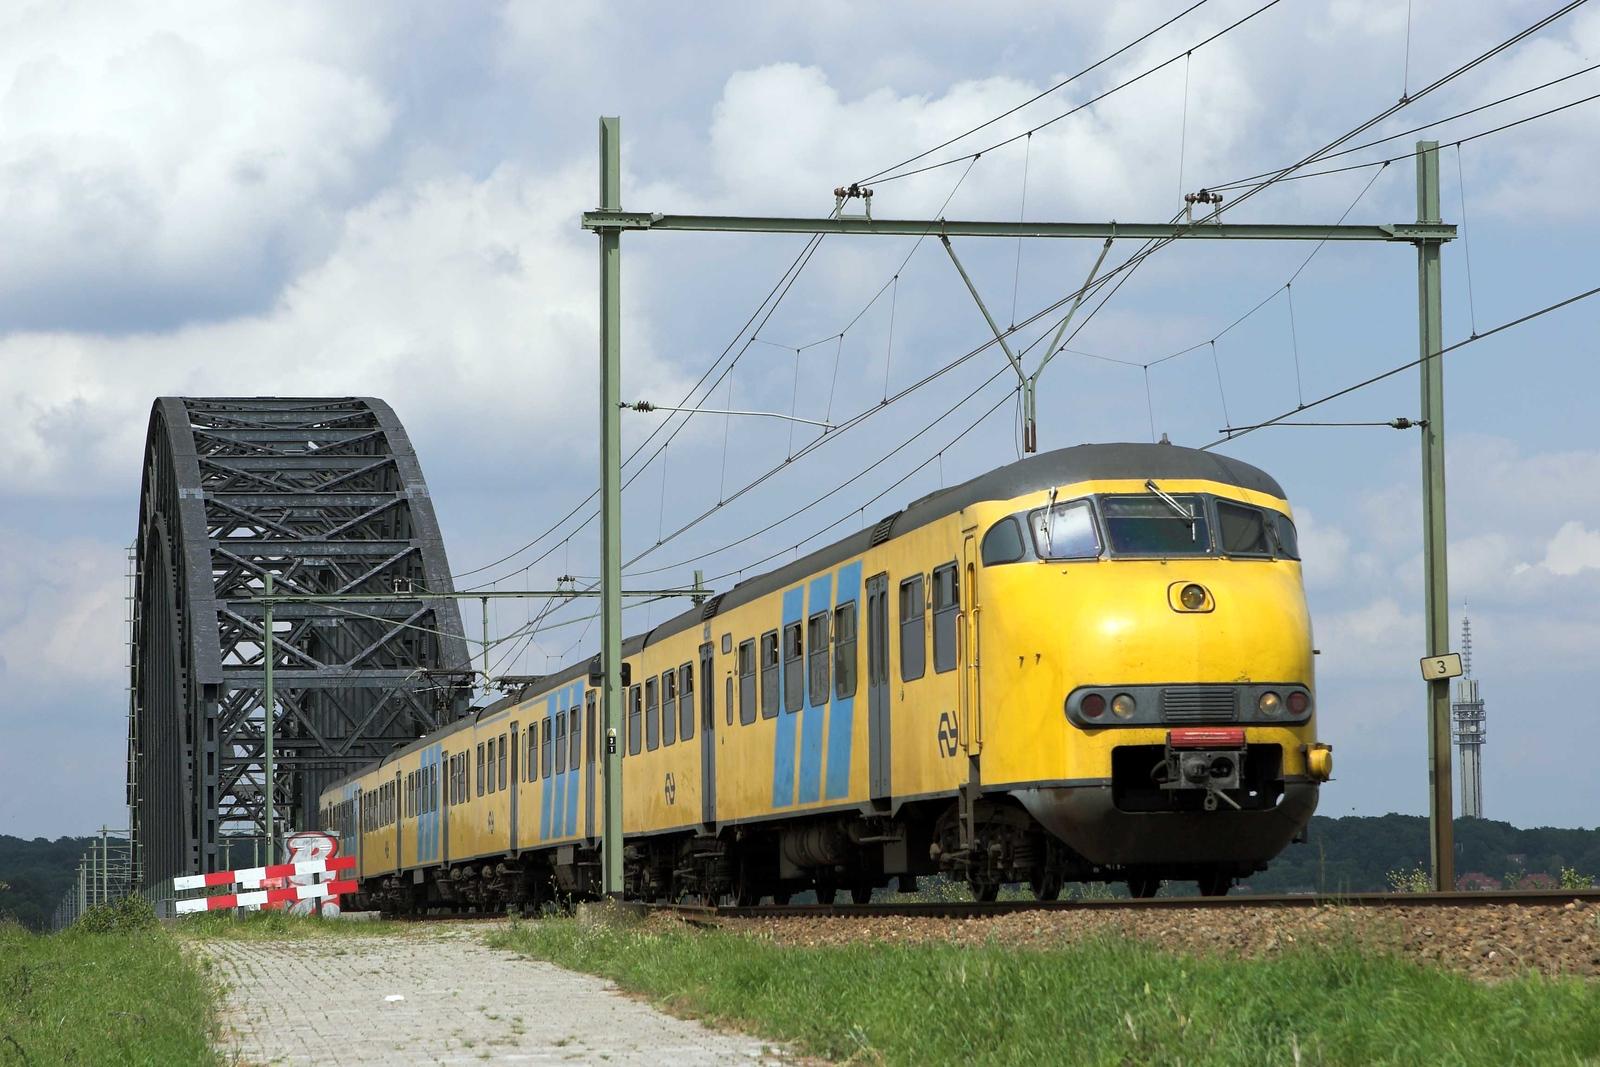 517 Arnhem Spoorbrug 4/6/2007<br /> 3757 1450 Zwolle-Nijmegen